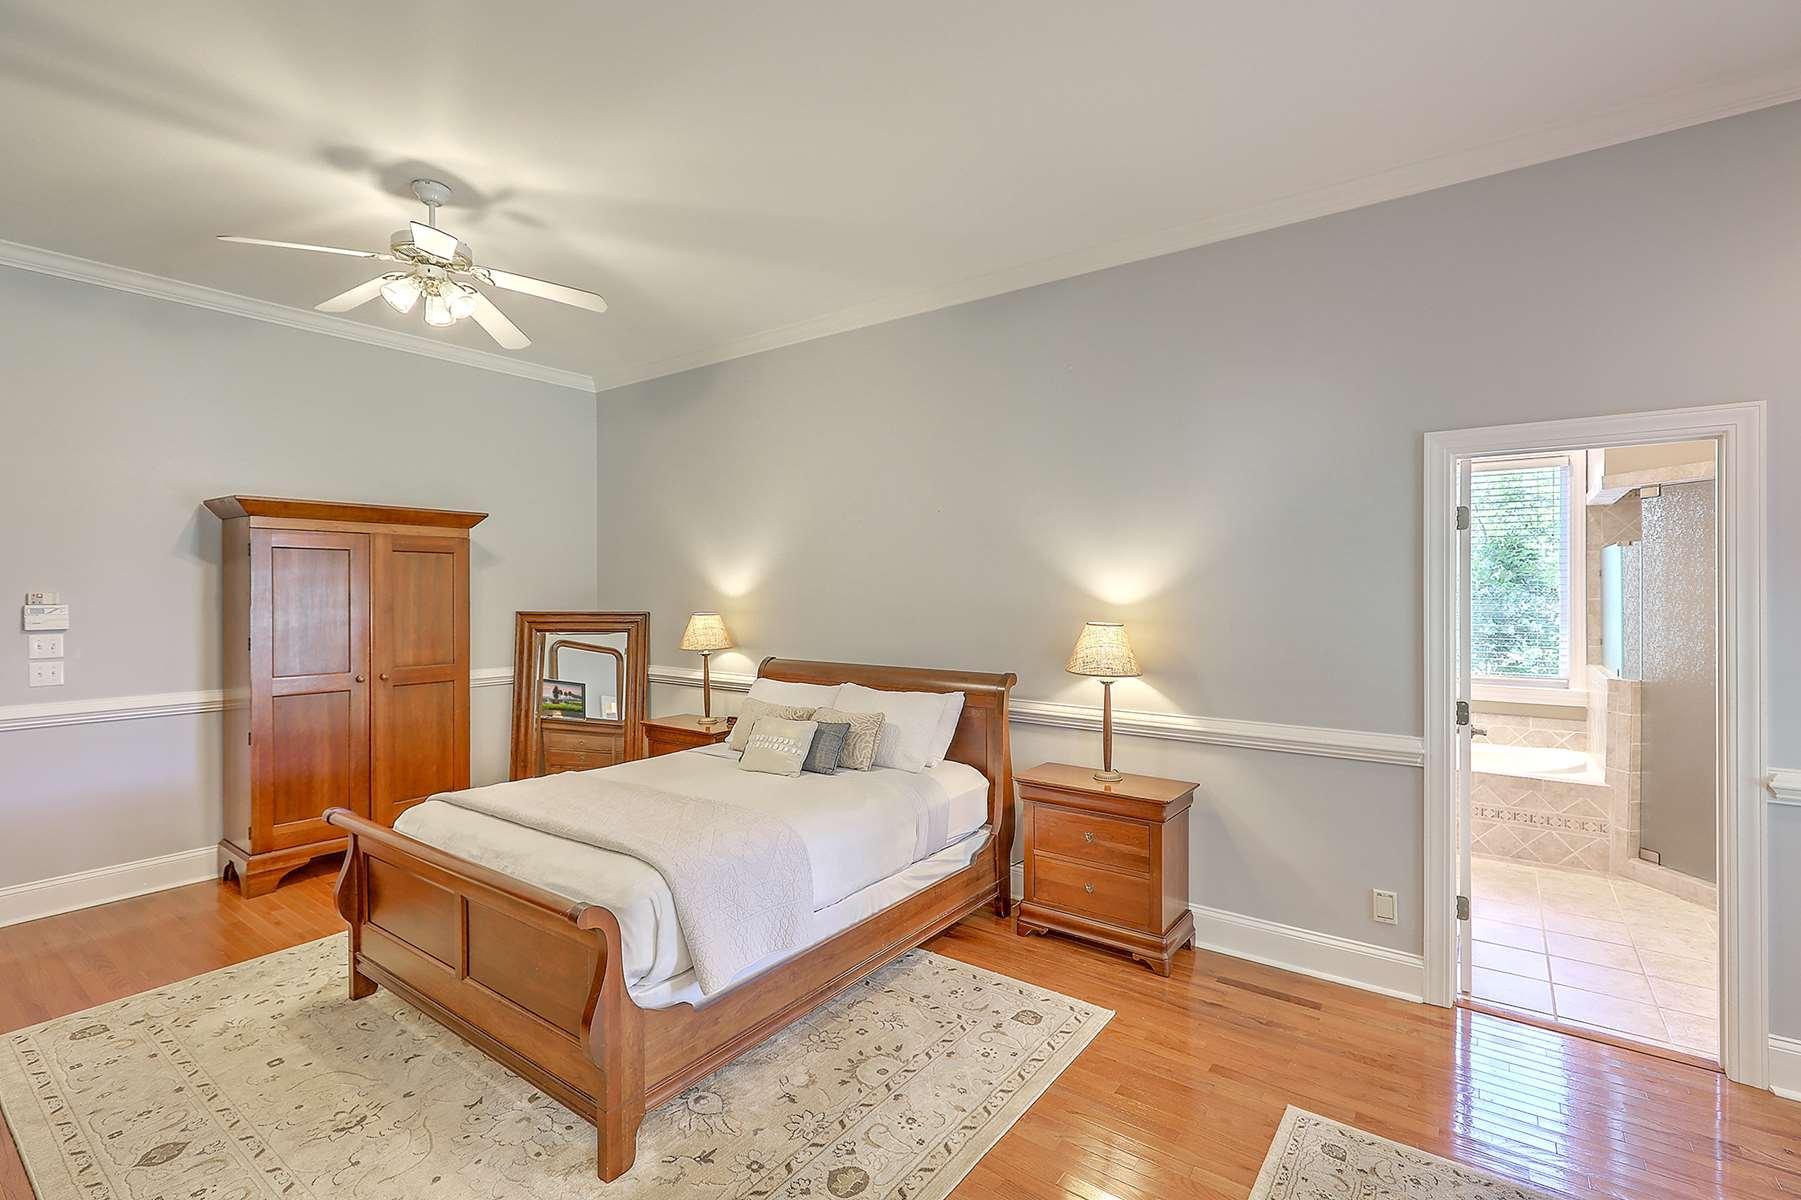 Dunes West Homes For Sale - 2961 Pignatelli, Mount Pleasant, SC - 12